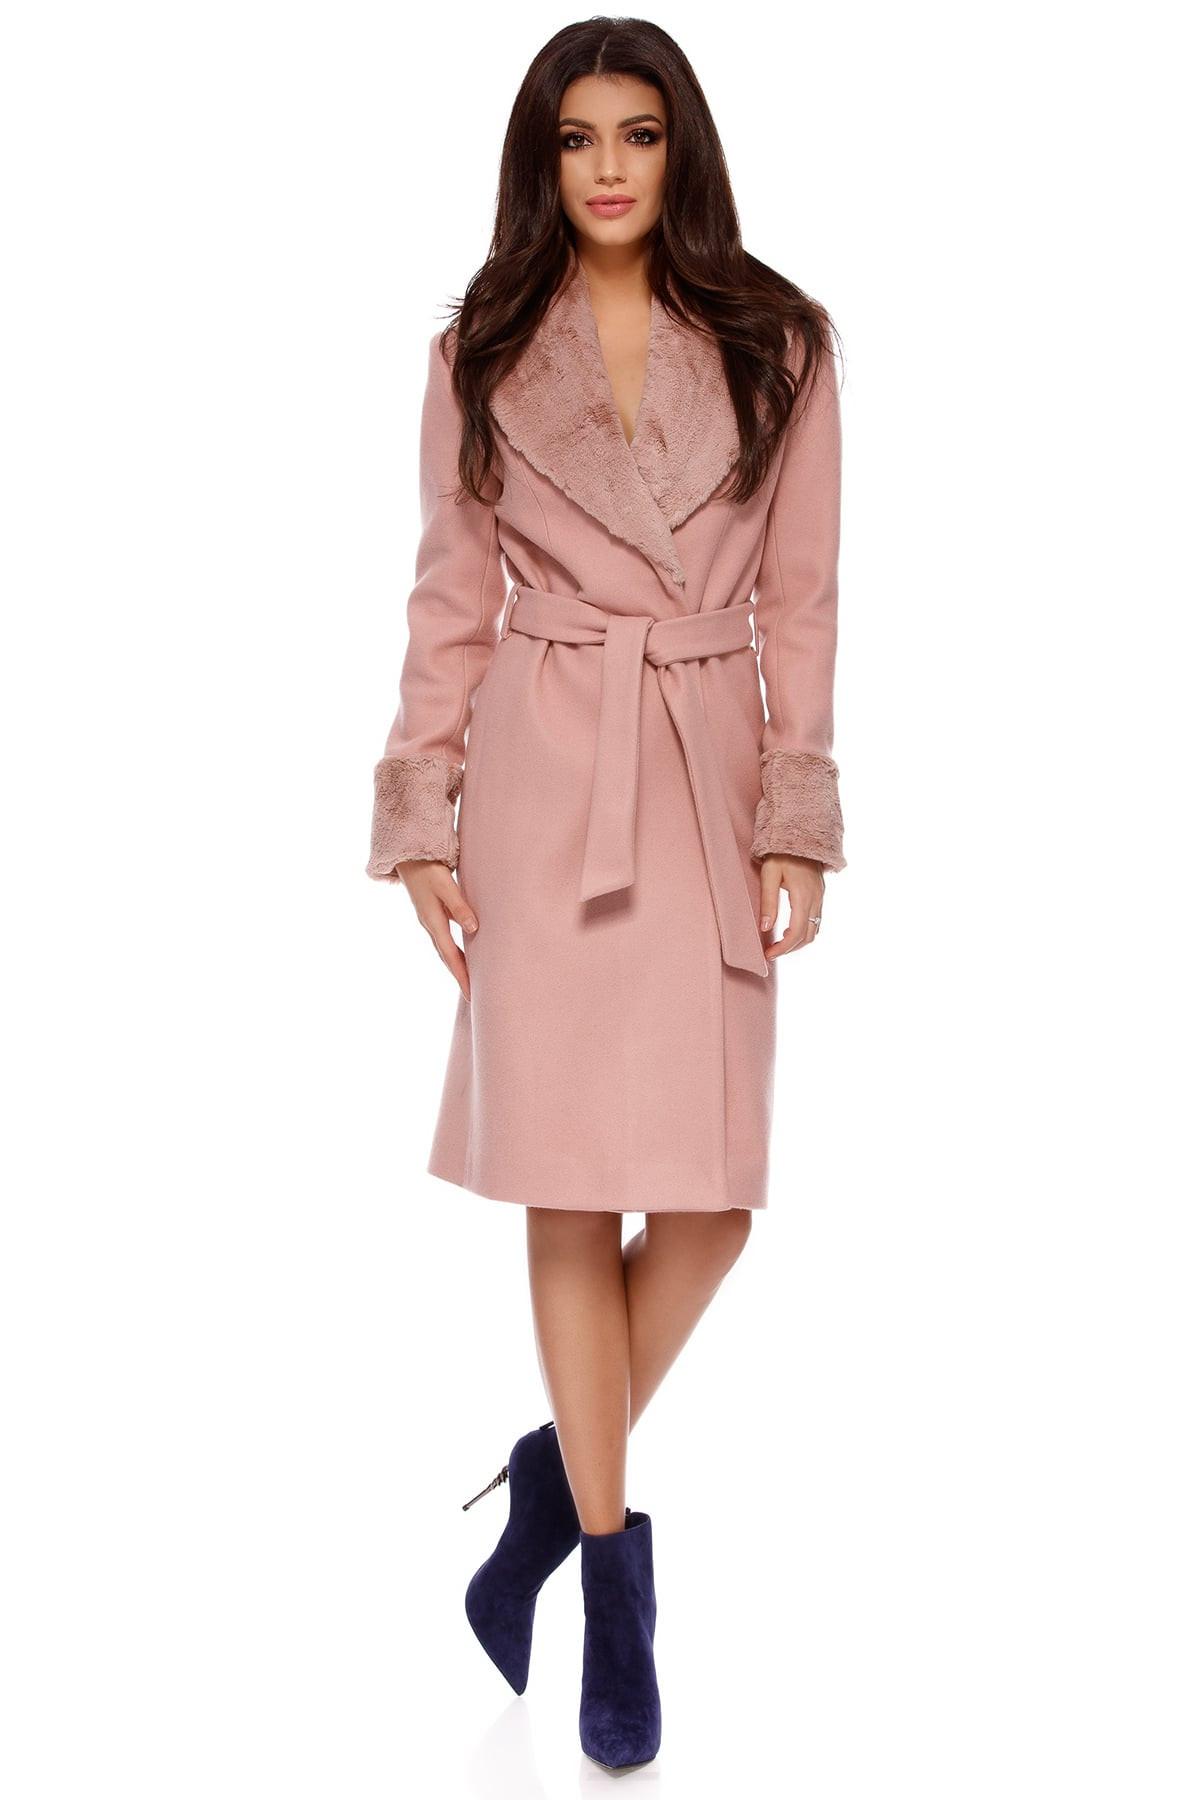 Palton Candy Roz Pudră